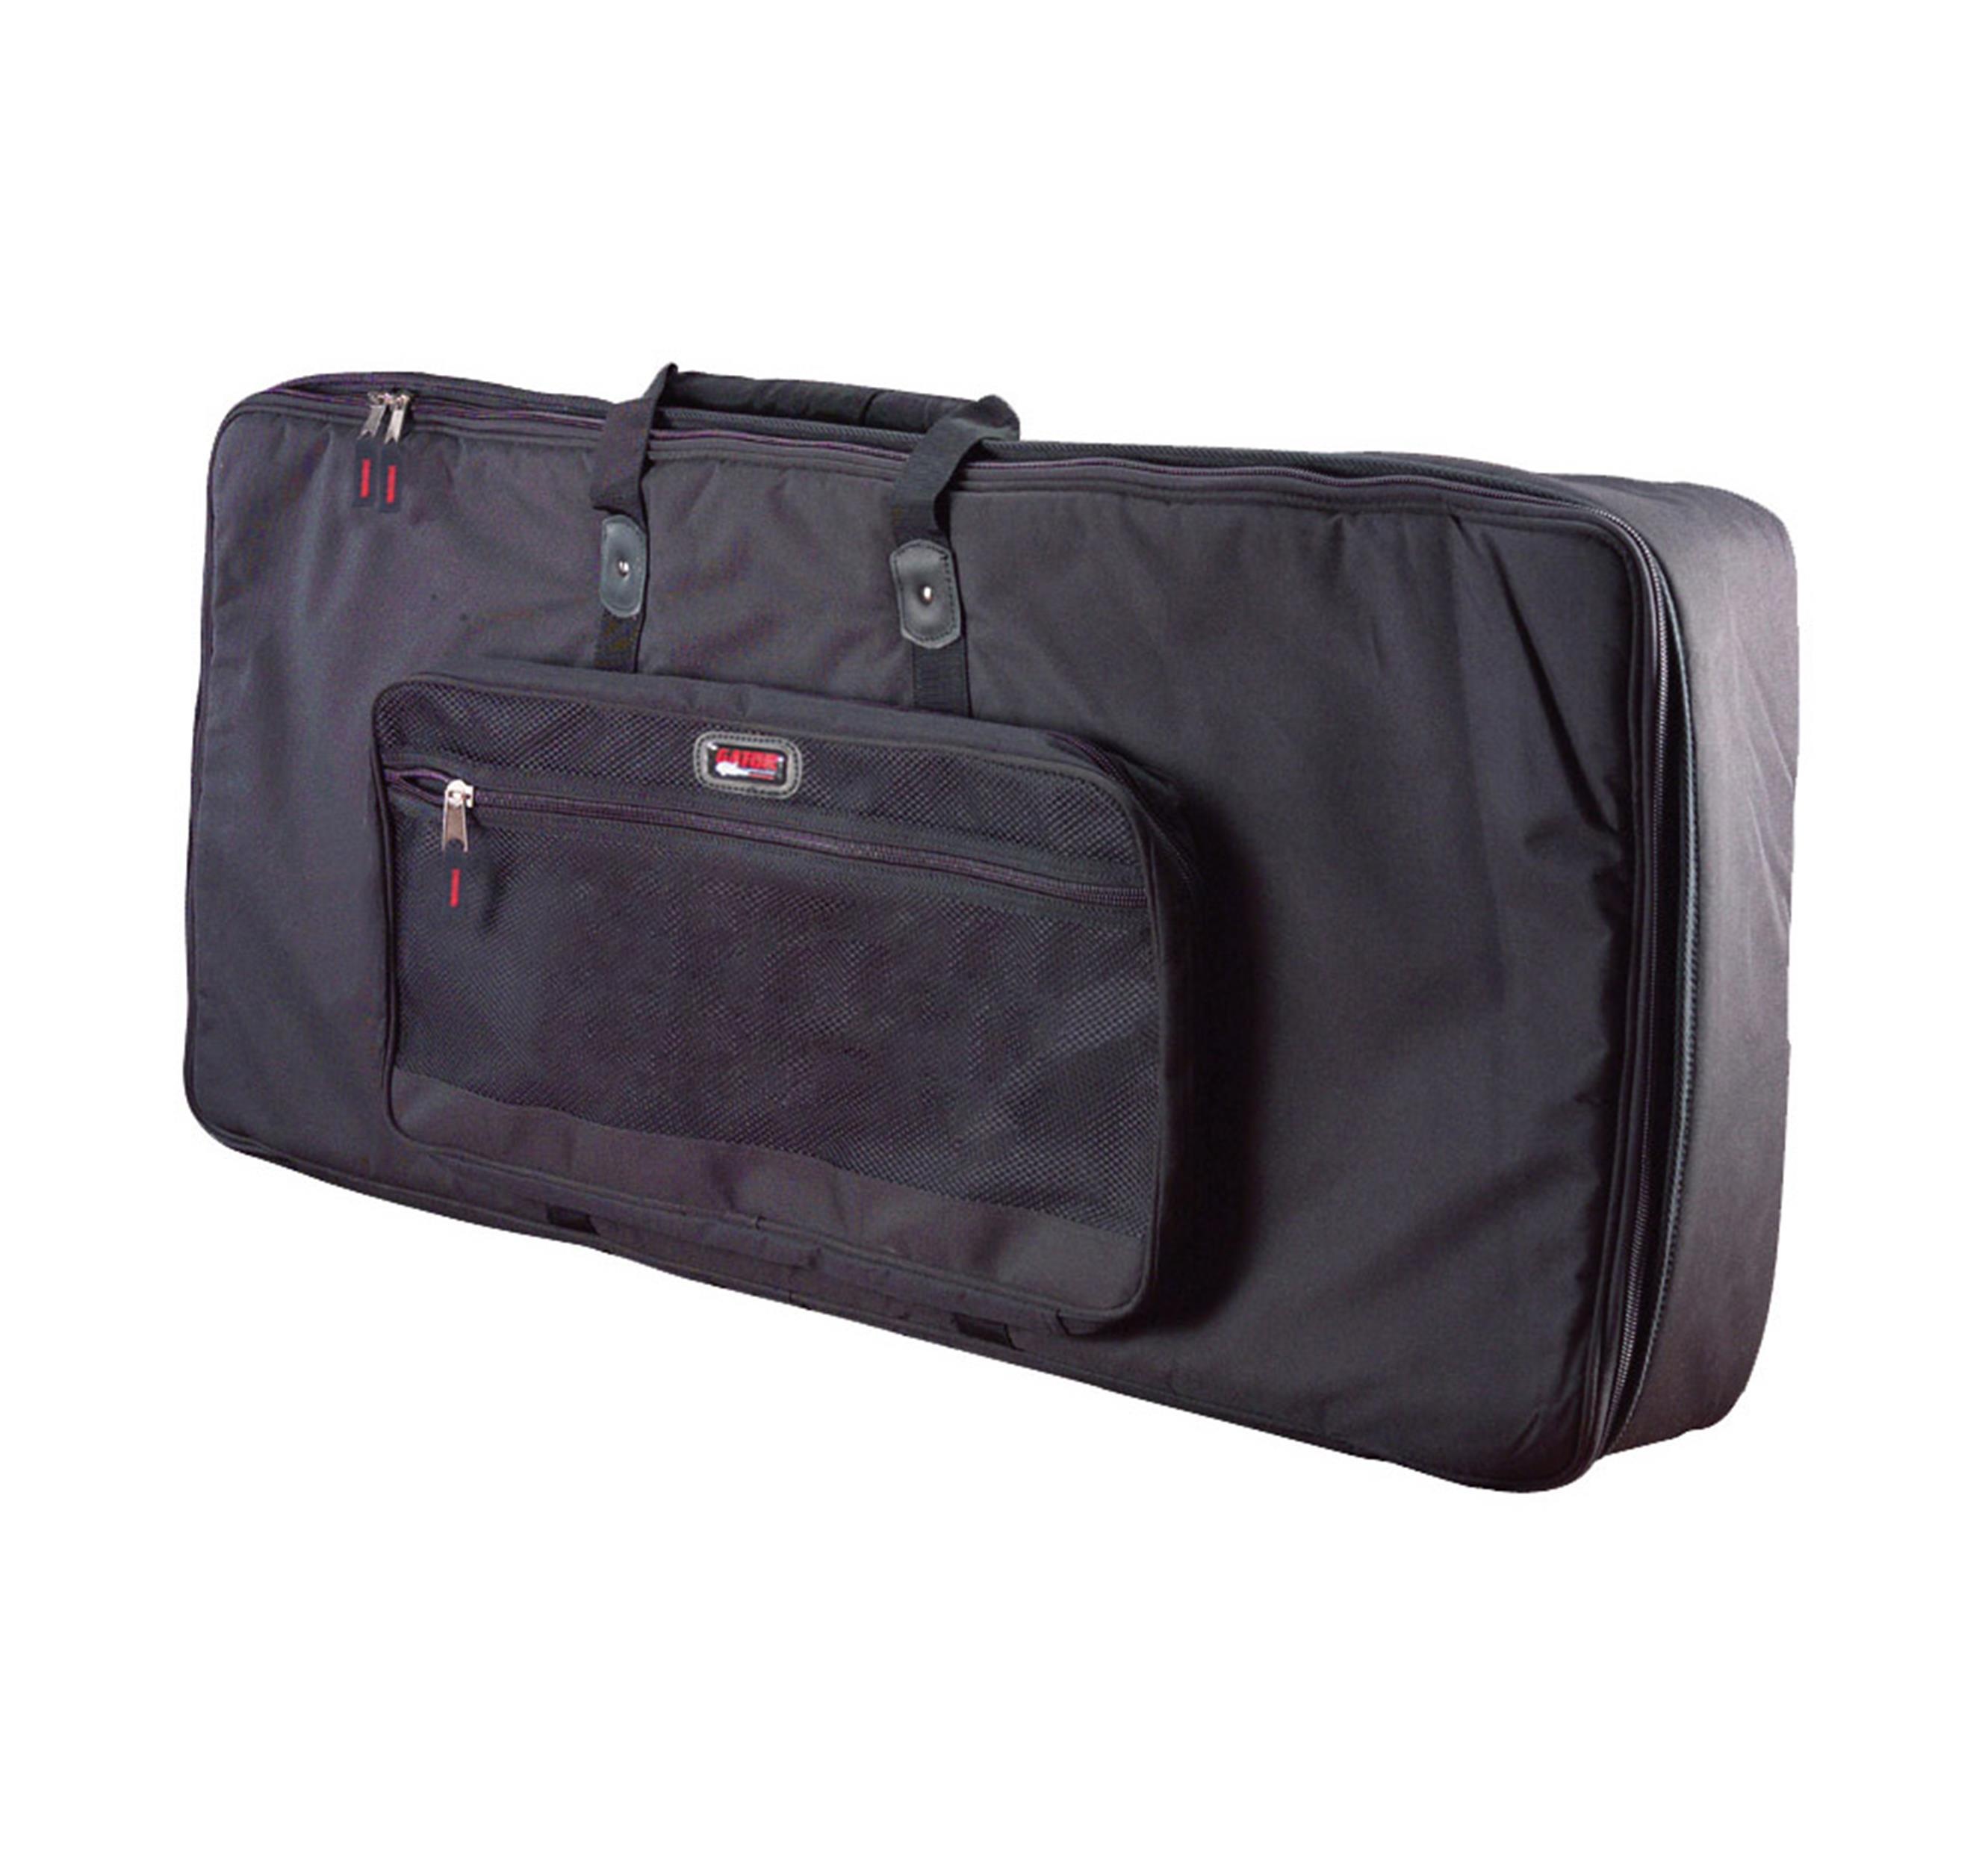 Gator GKB-49 - borsa per tastiera 49 tasti - Dj Equipment Accessori - Borse e Custodie DJ